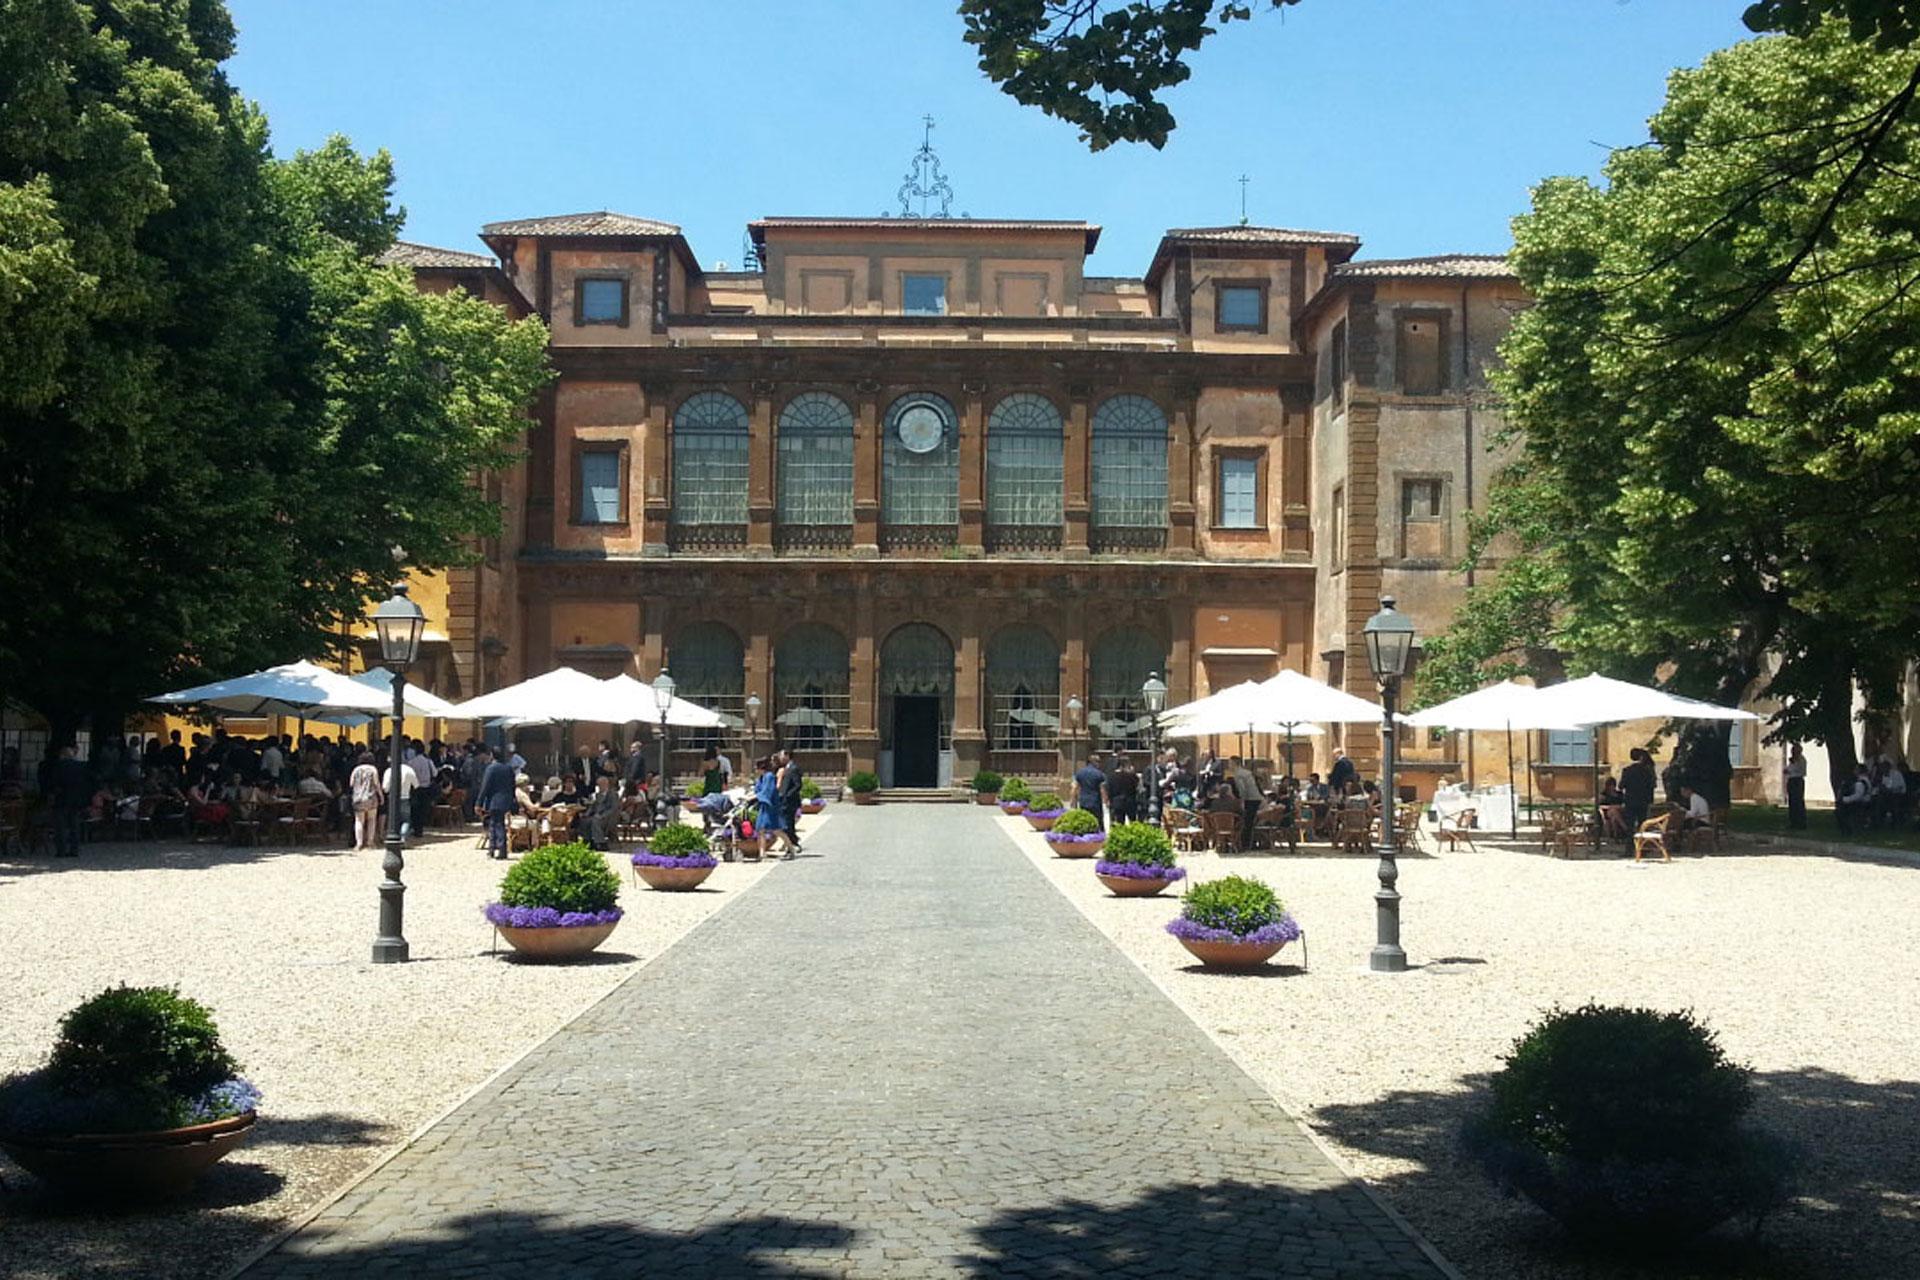 Villa Mondragone